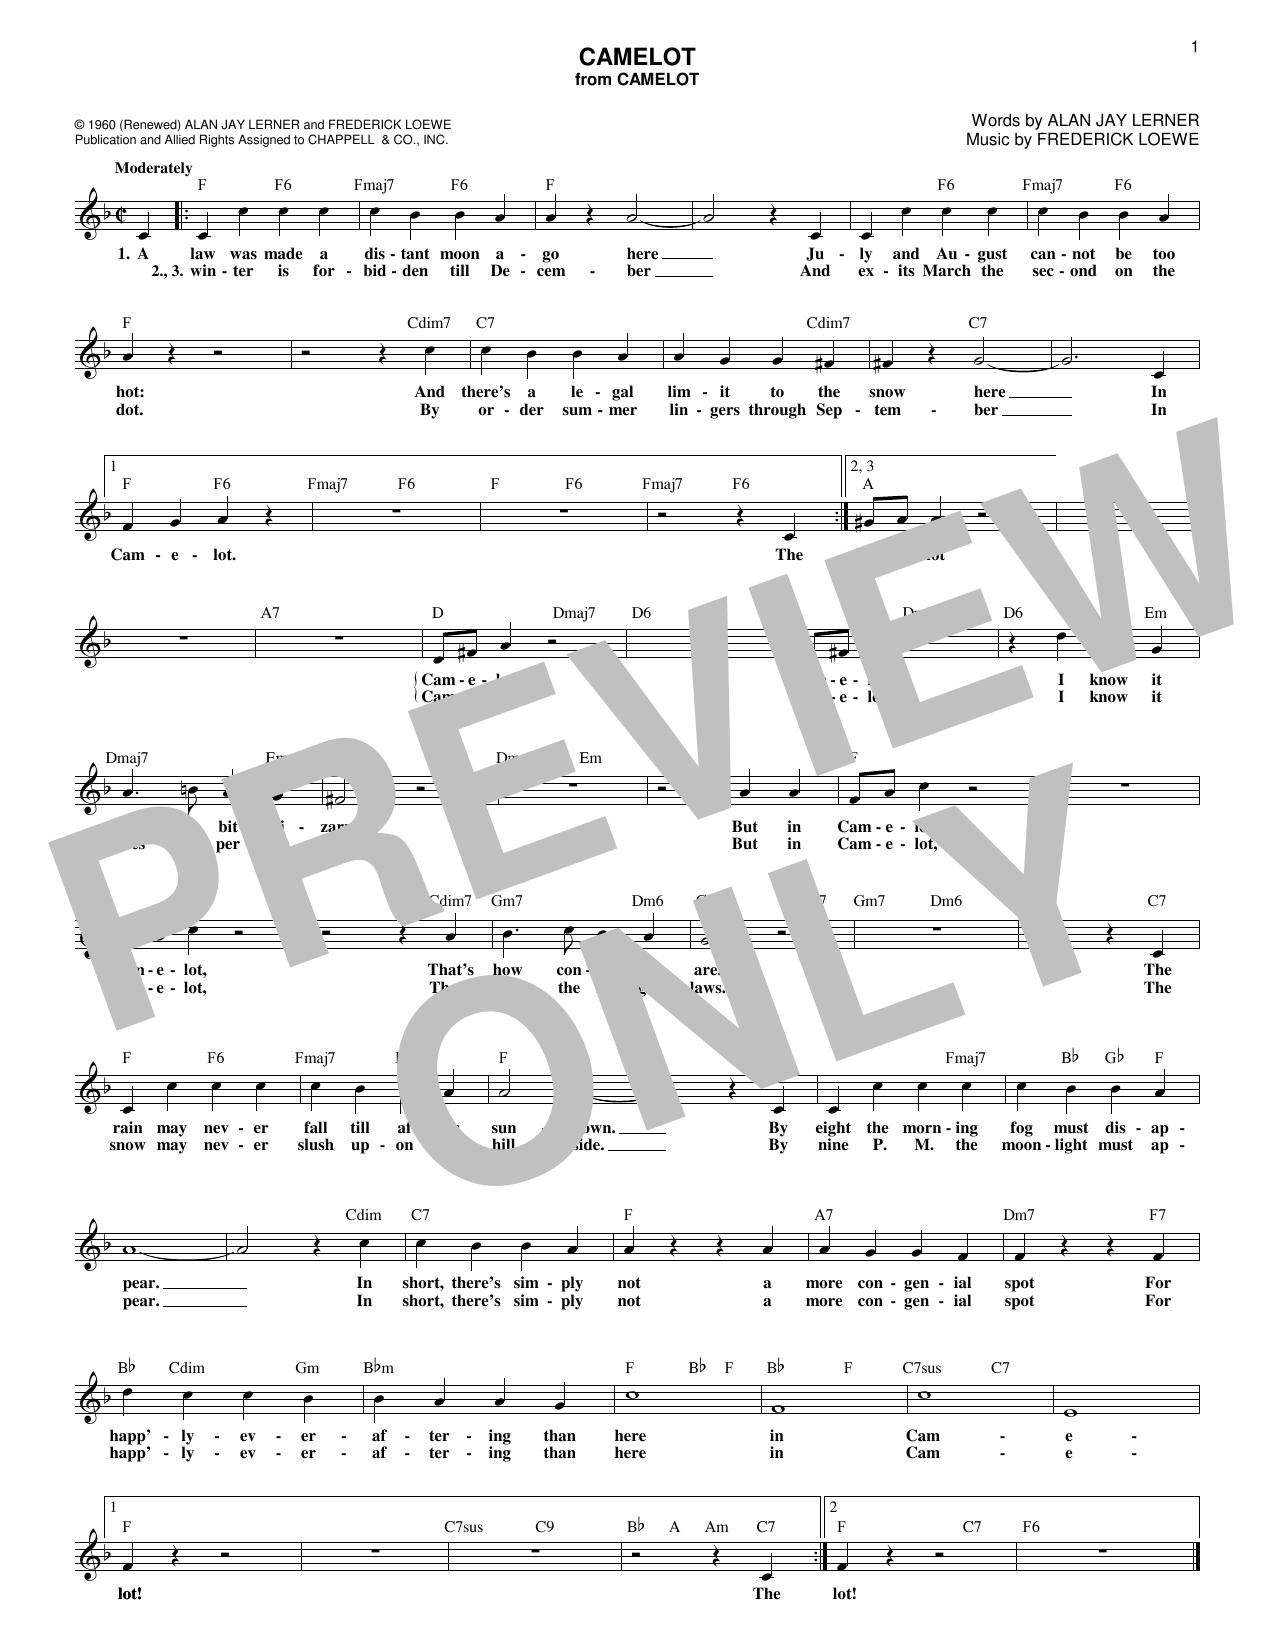 Alan Jay Lerner Camelot sheet music notes and chords. Download Printable PDF.